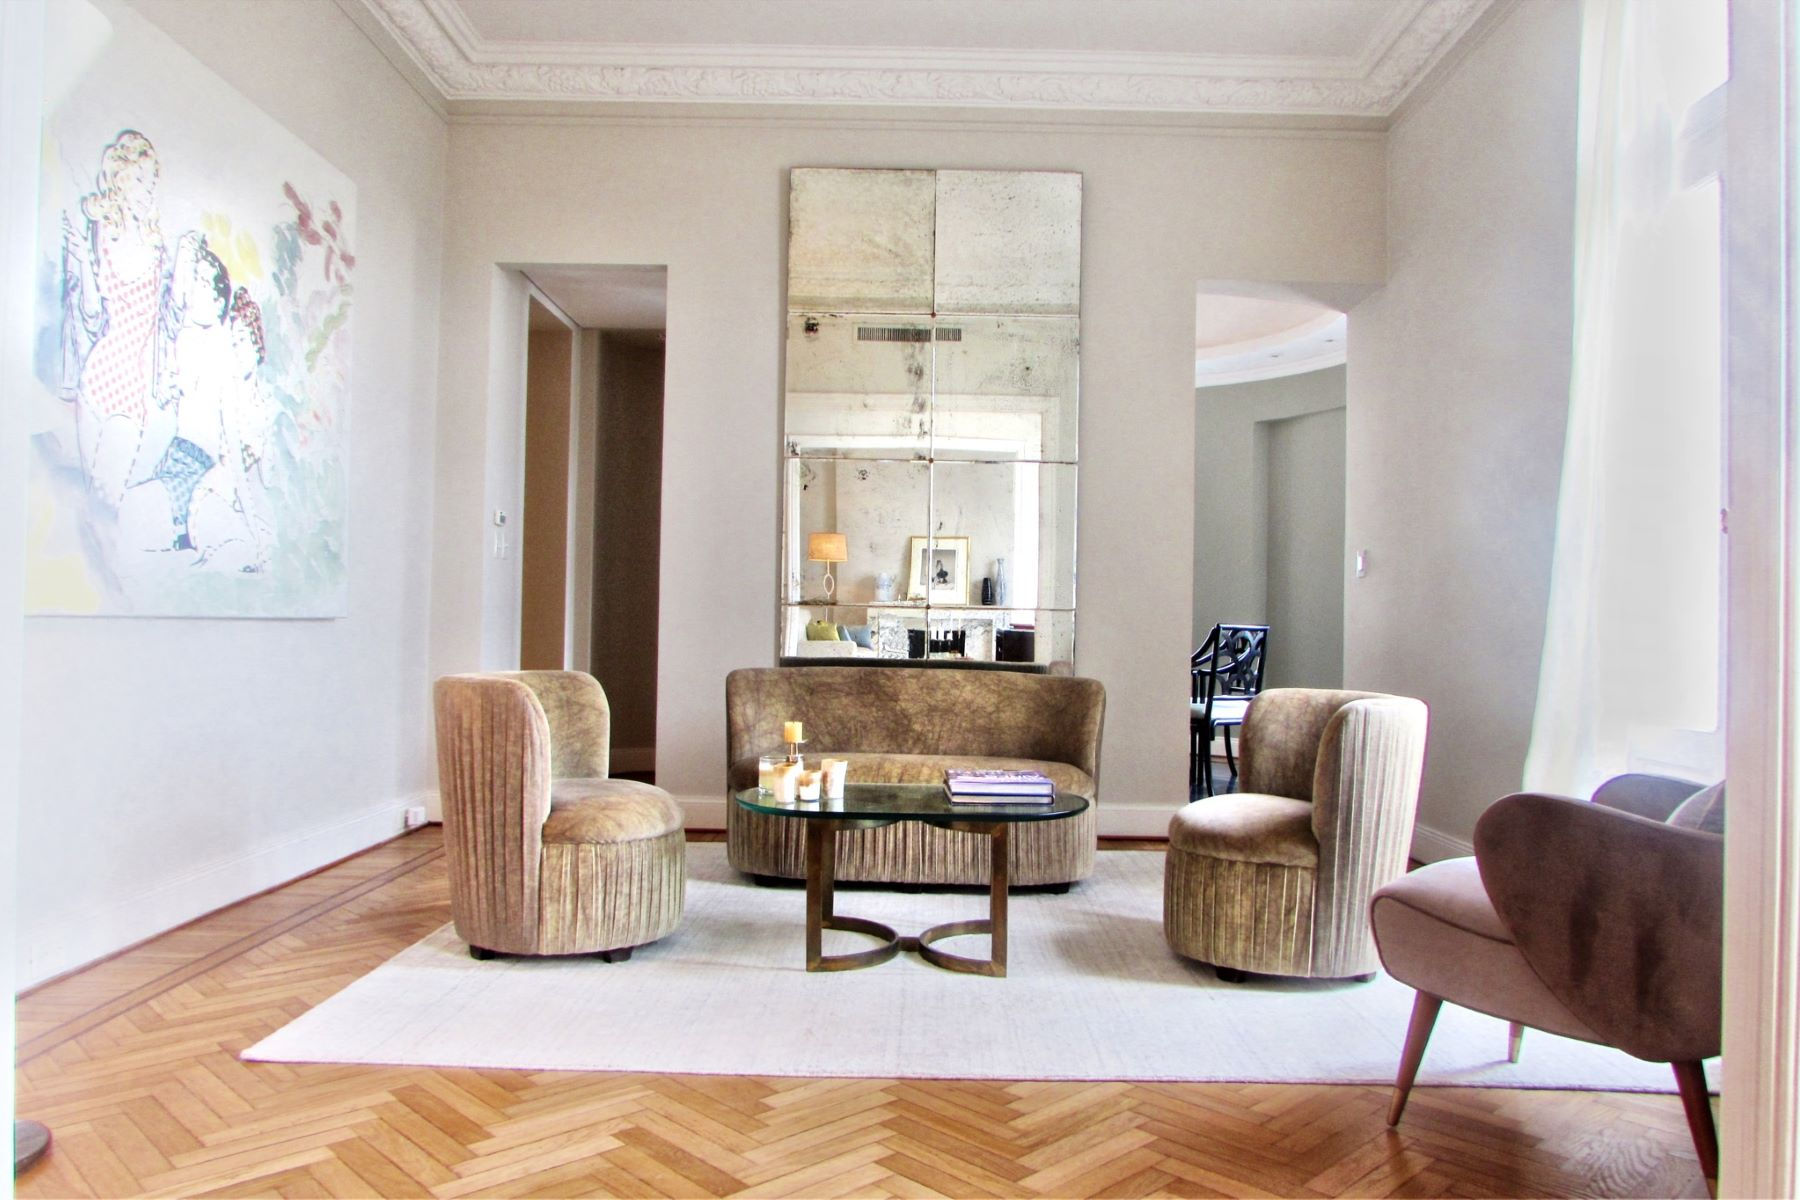 Imóvel para arrendar Buenos Aires